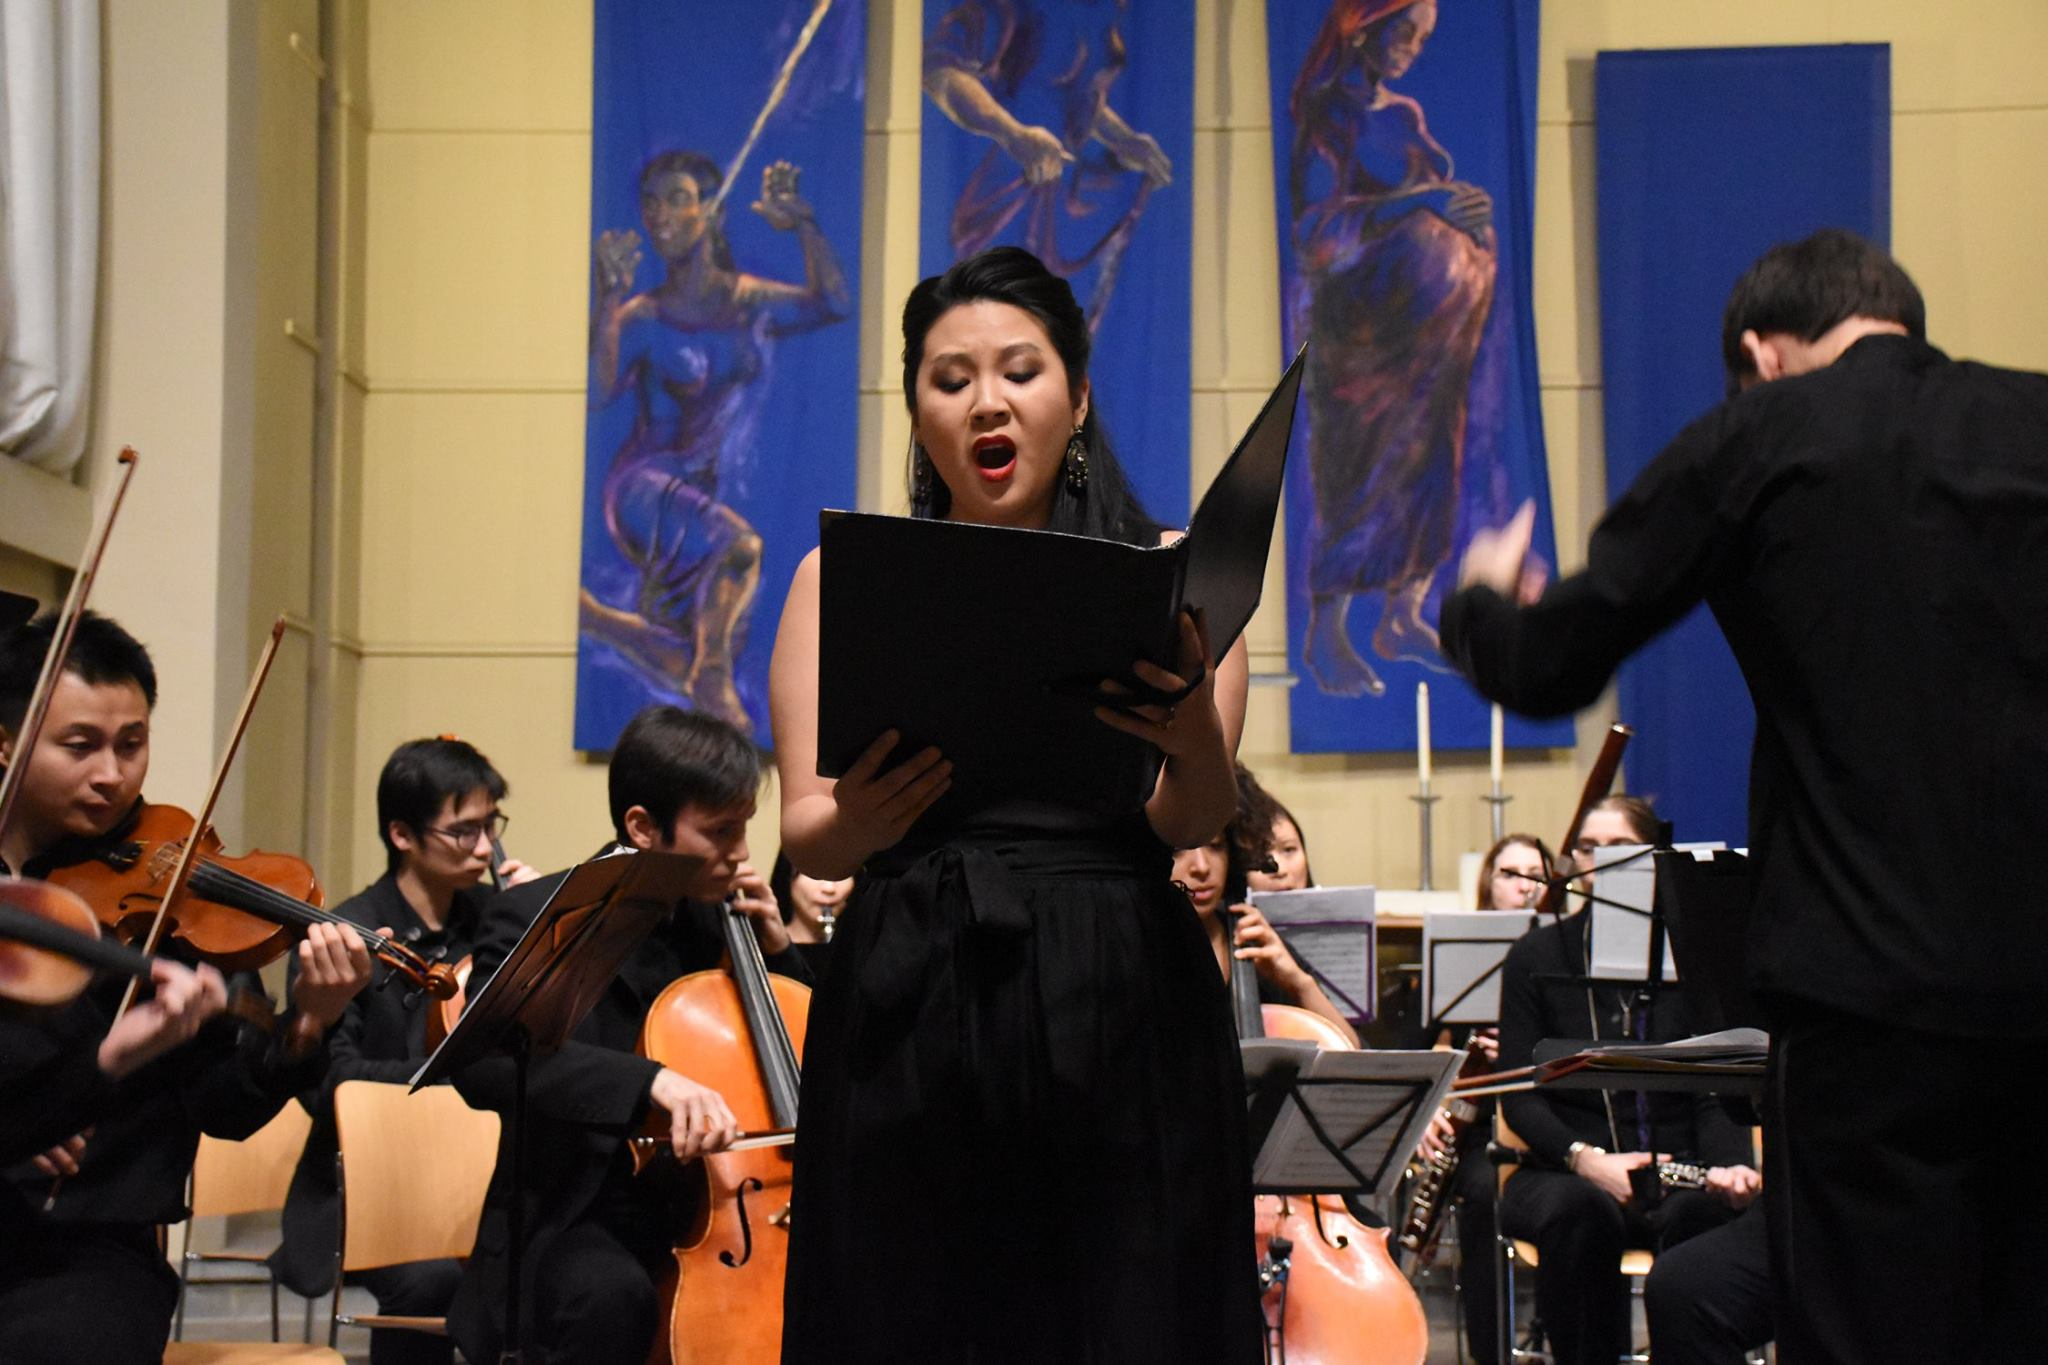 Fanny Mendelssohn Hensel's  Lobgesang  with the DuBois Orchestra at Harvard University. Kai Johannes Polzhofer, conductor.